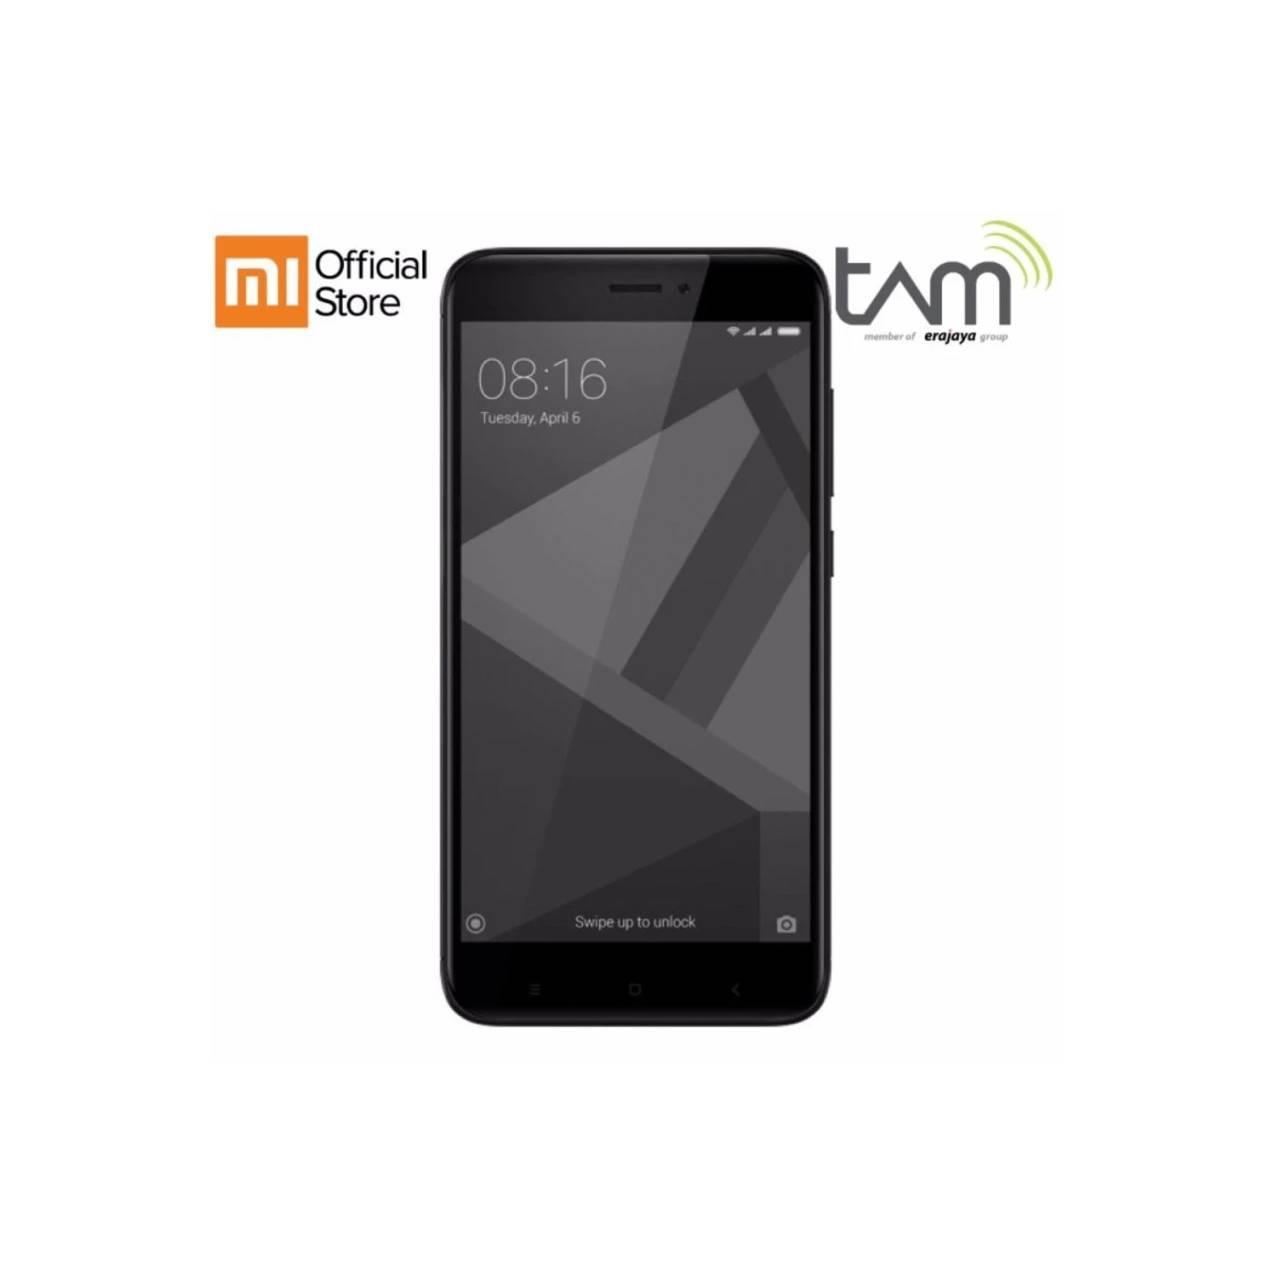 Xiaomi Redmi 4x Prime 332gb Garansi Resmi Tam Daftar Harga 32gb 1 Tahun Ram 3gb